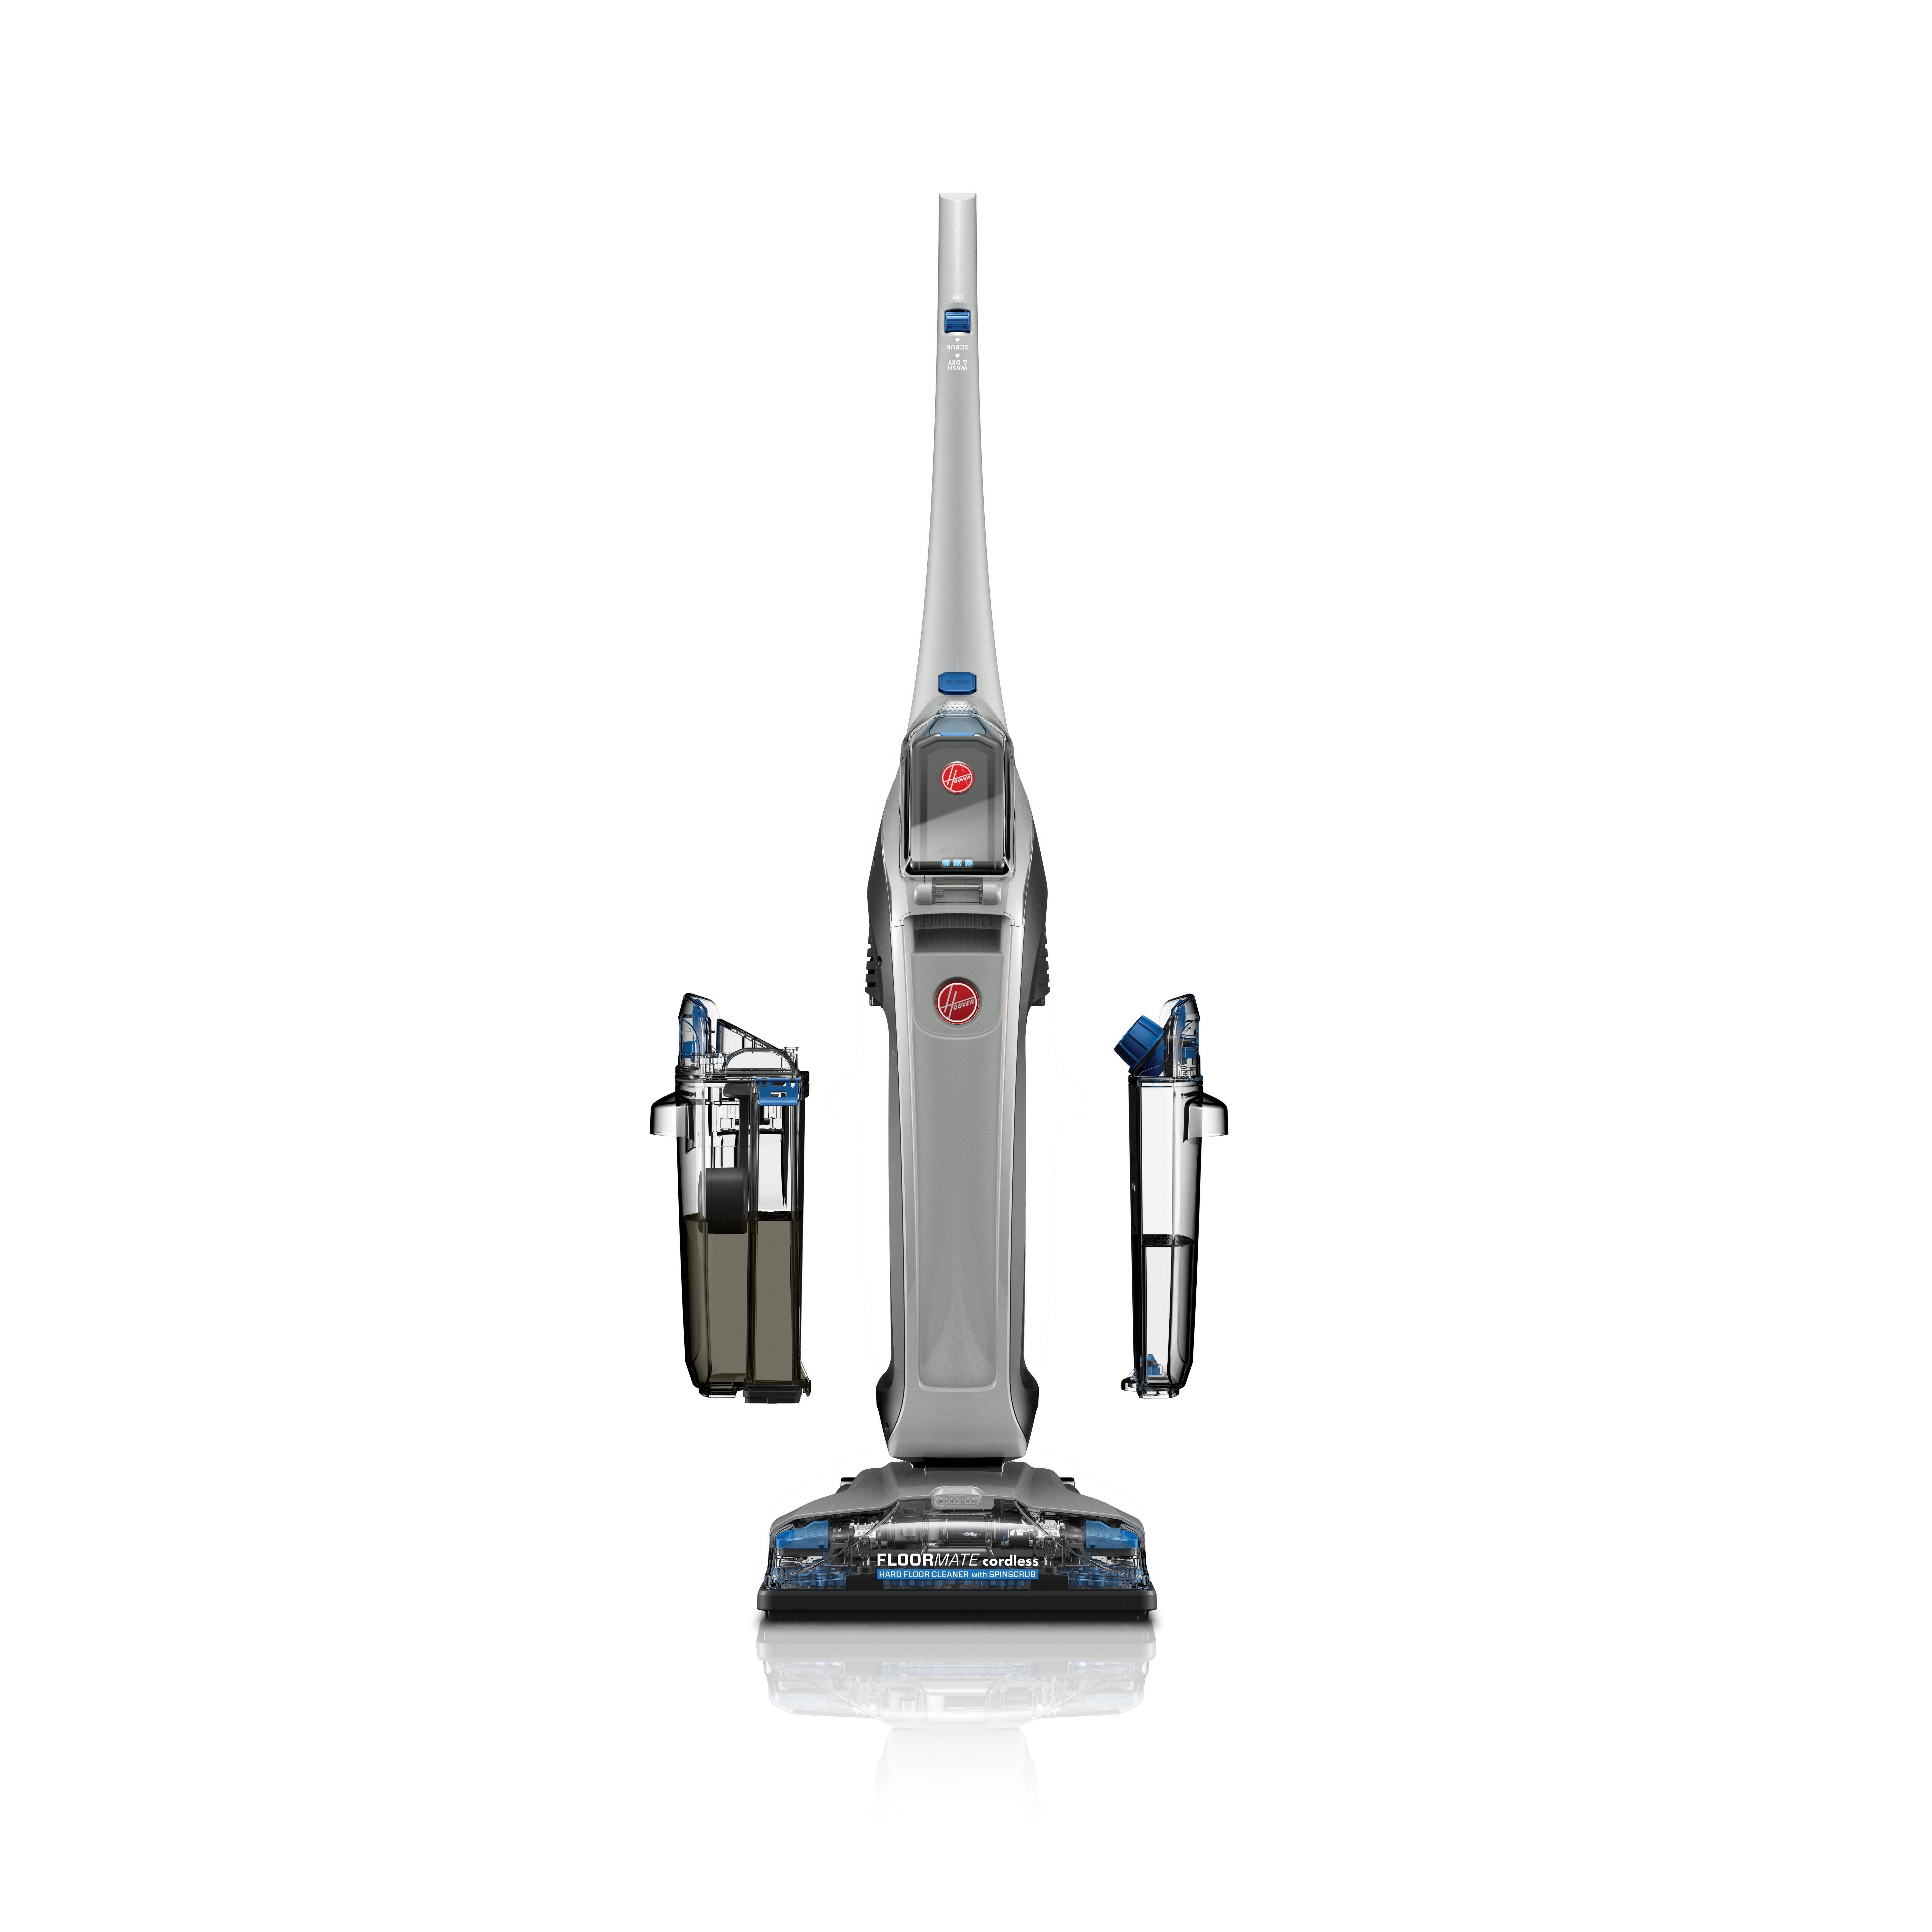 FloorMate Cordless Hard Floor Cleaner3